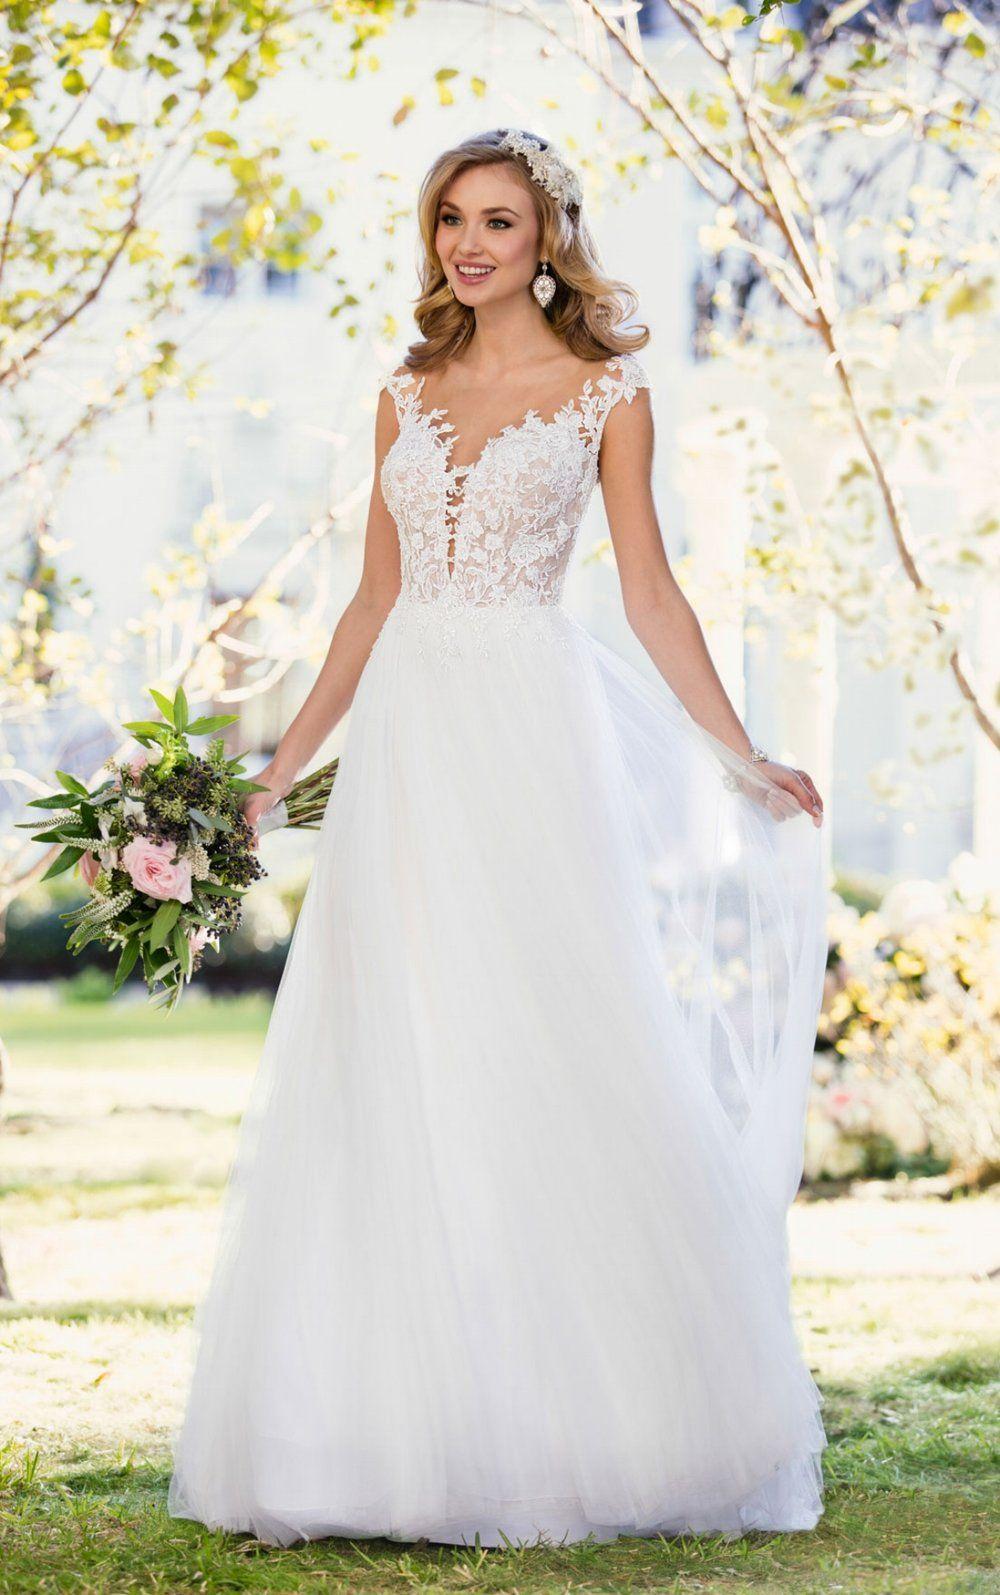 StellaYork 188 188 18.jpg   Stella york wedding dress, Casual ...